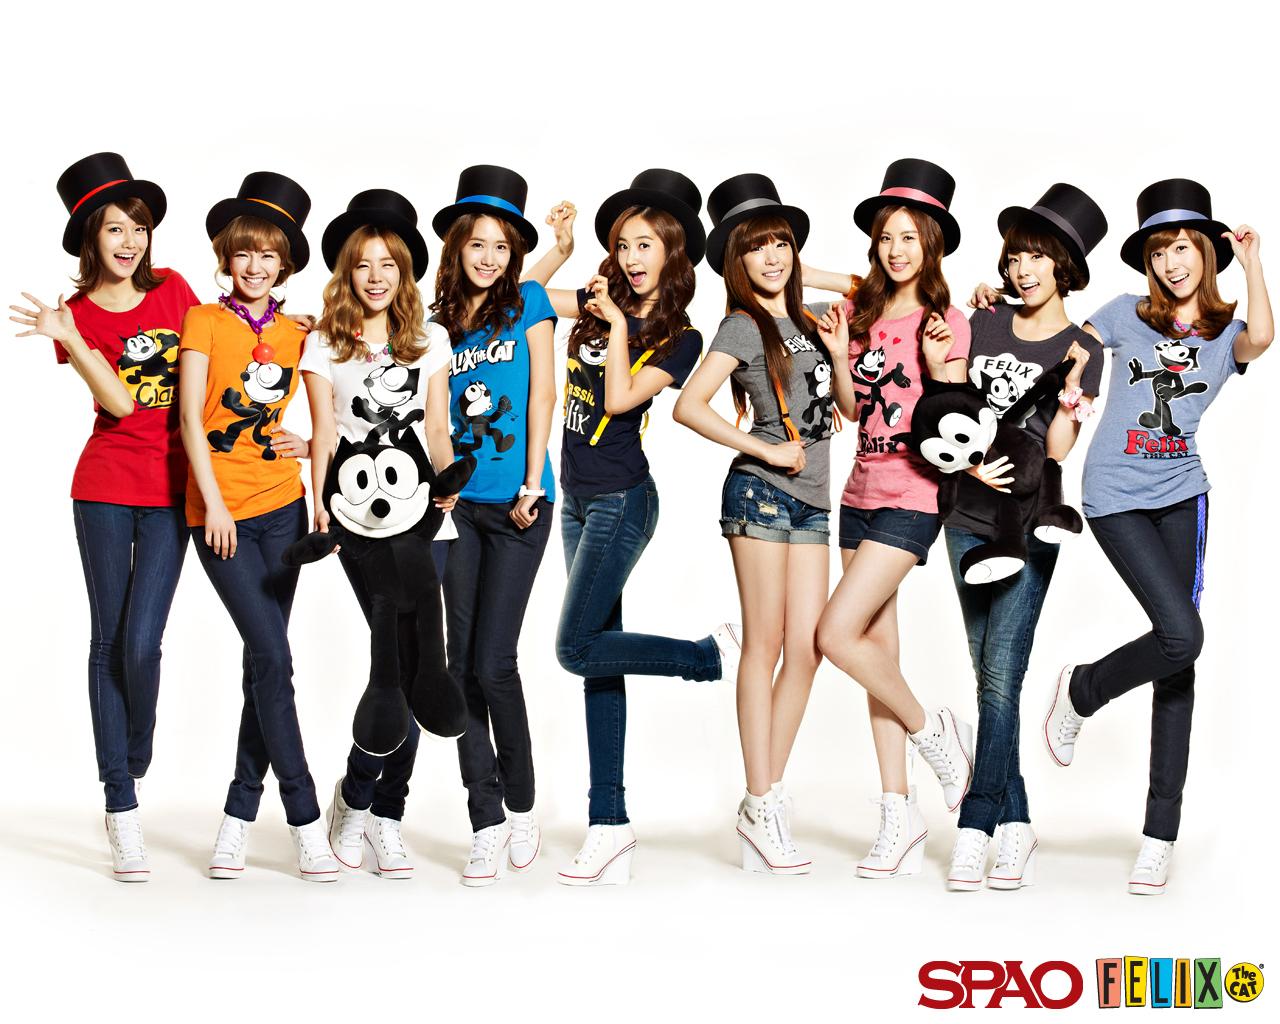 SNSD-SPAO-Felix-The-Cat-girls-generation-snsd-